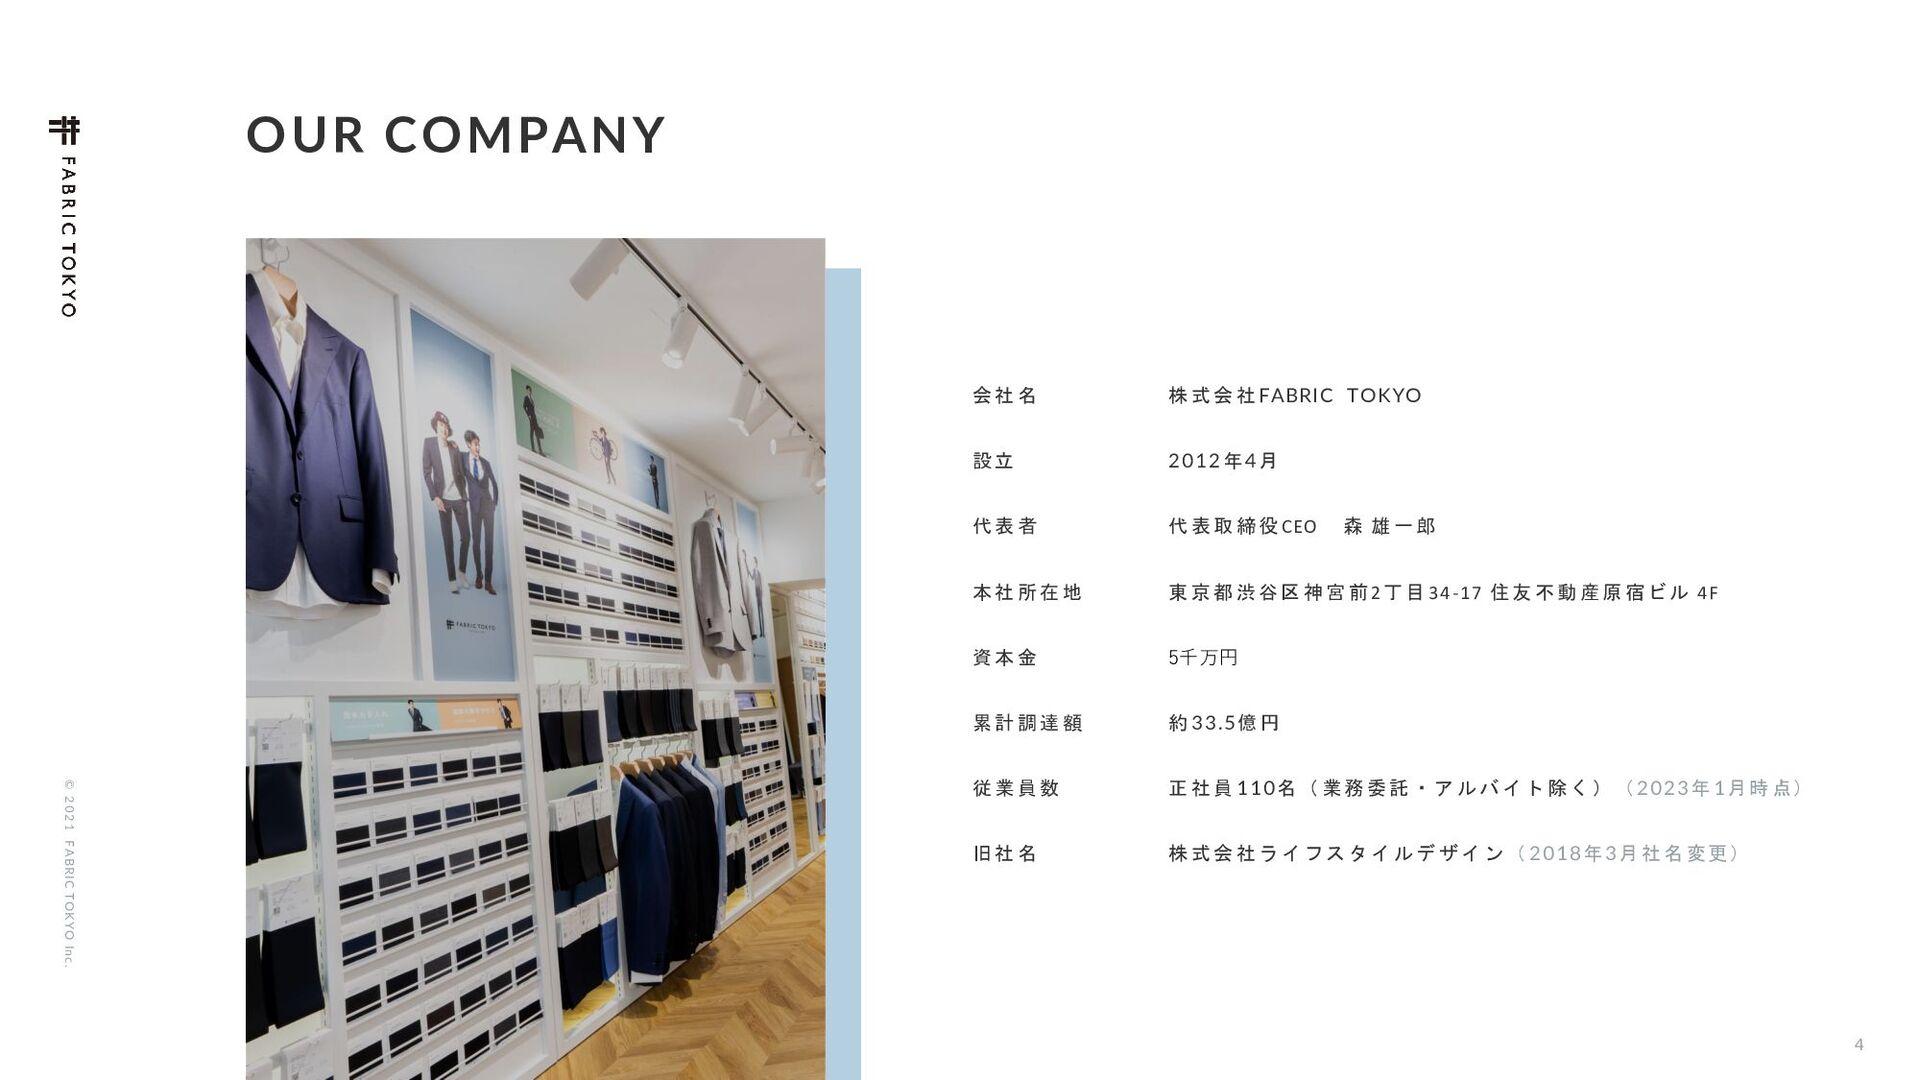 © 2021 FABRIC TOKYO Inc. 4 OUR COMPANY ձ໊ࣾ גࣜձࣾ...